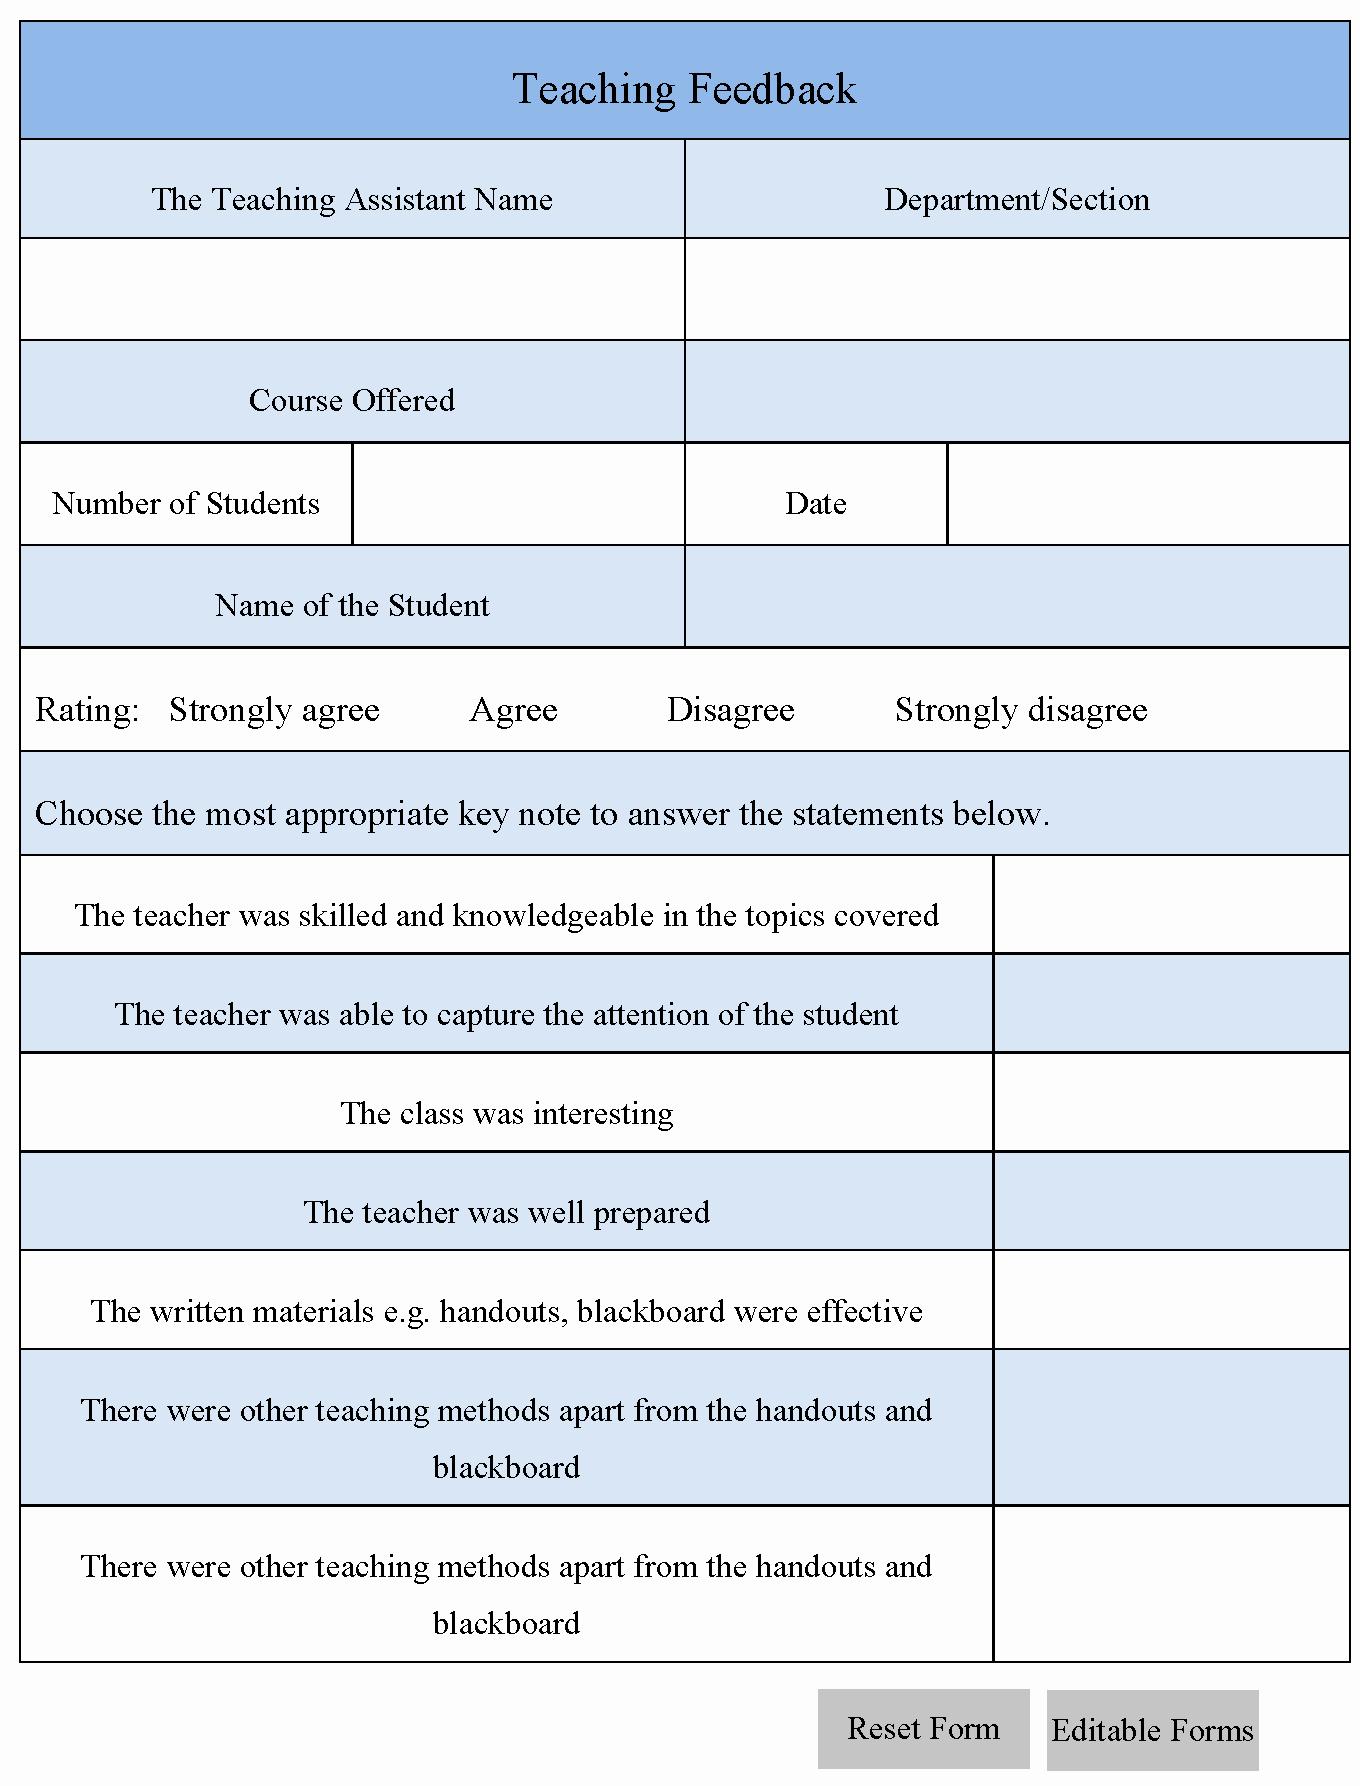 Teaching Feedback forms Best Of Teaching Feedback form